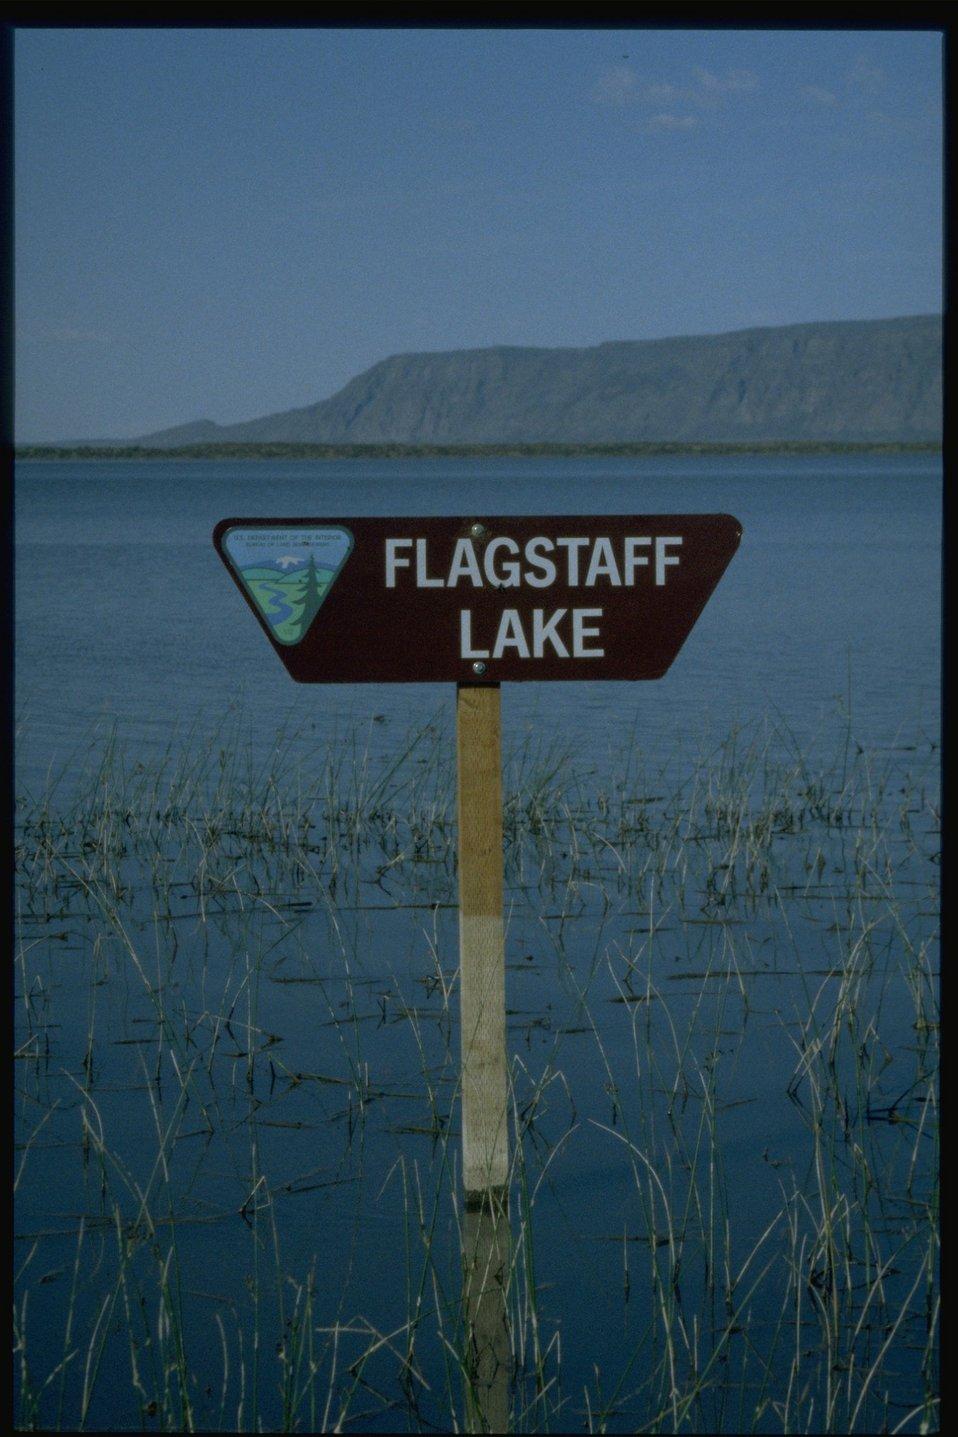 Flagstaff Lake.